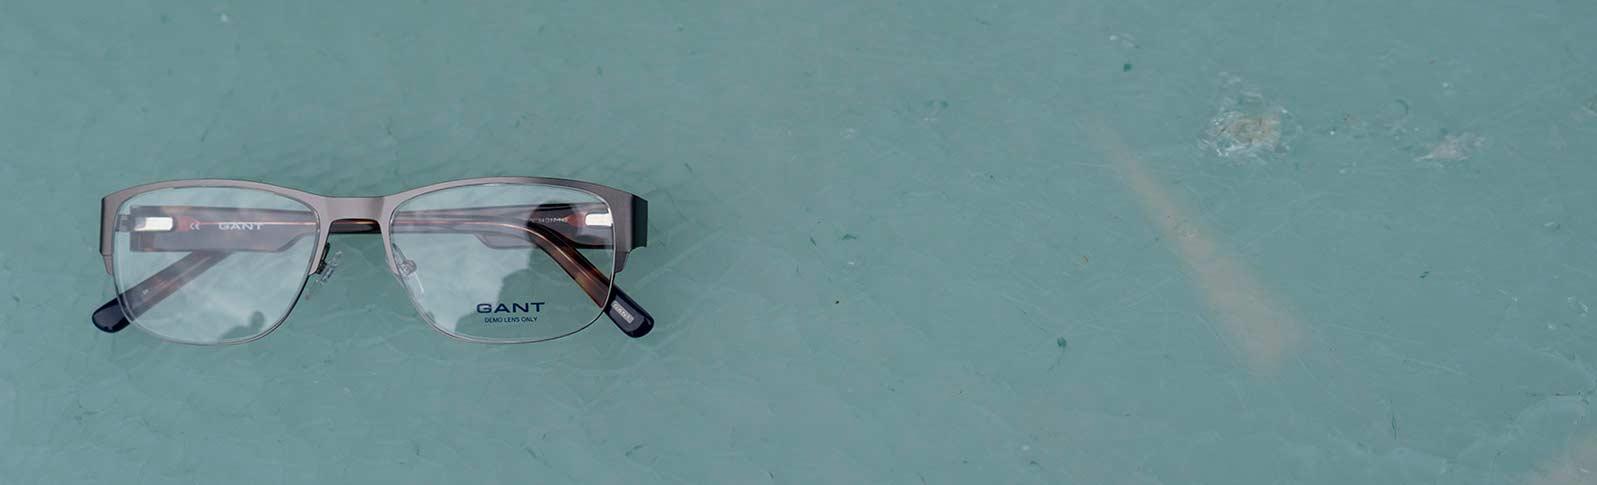 Briller fra Gant på et bord